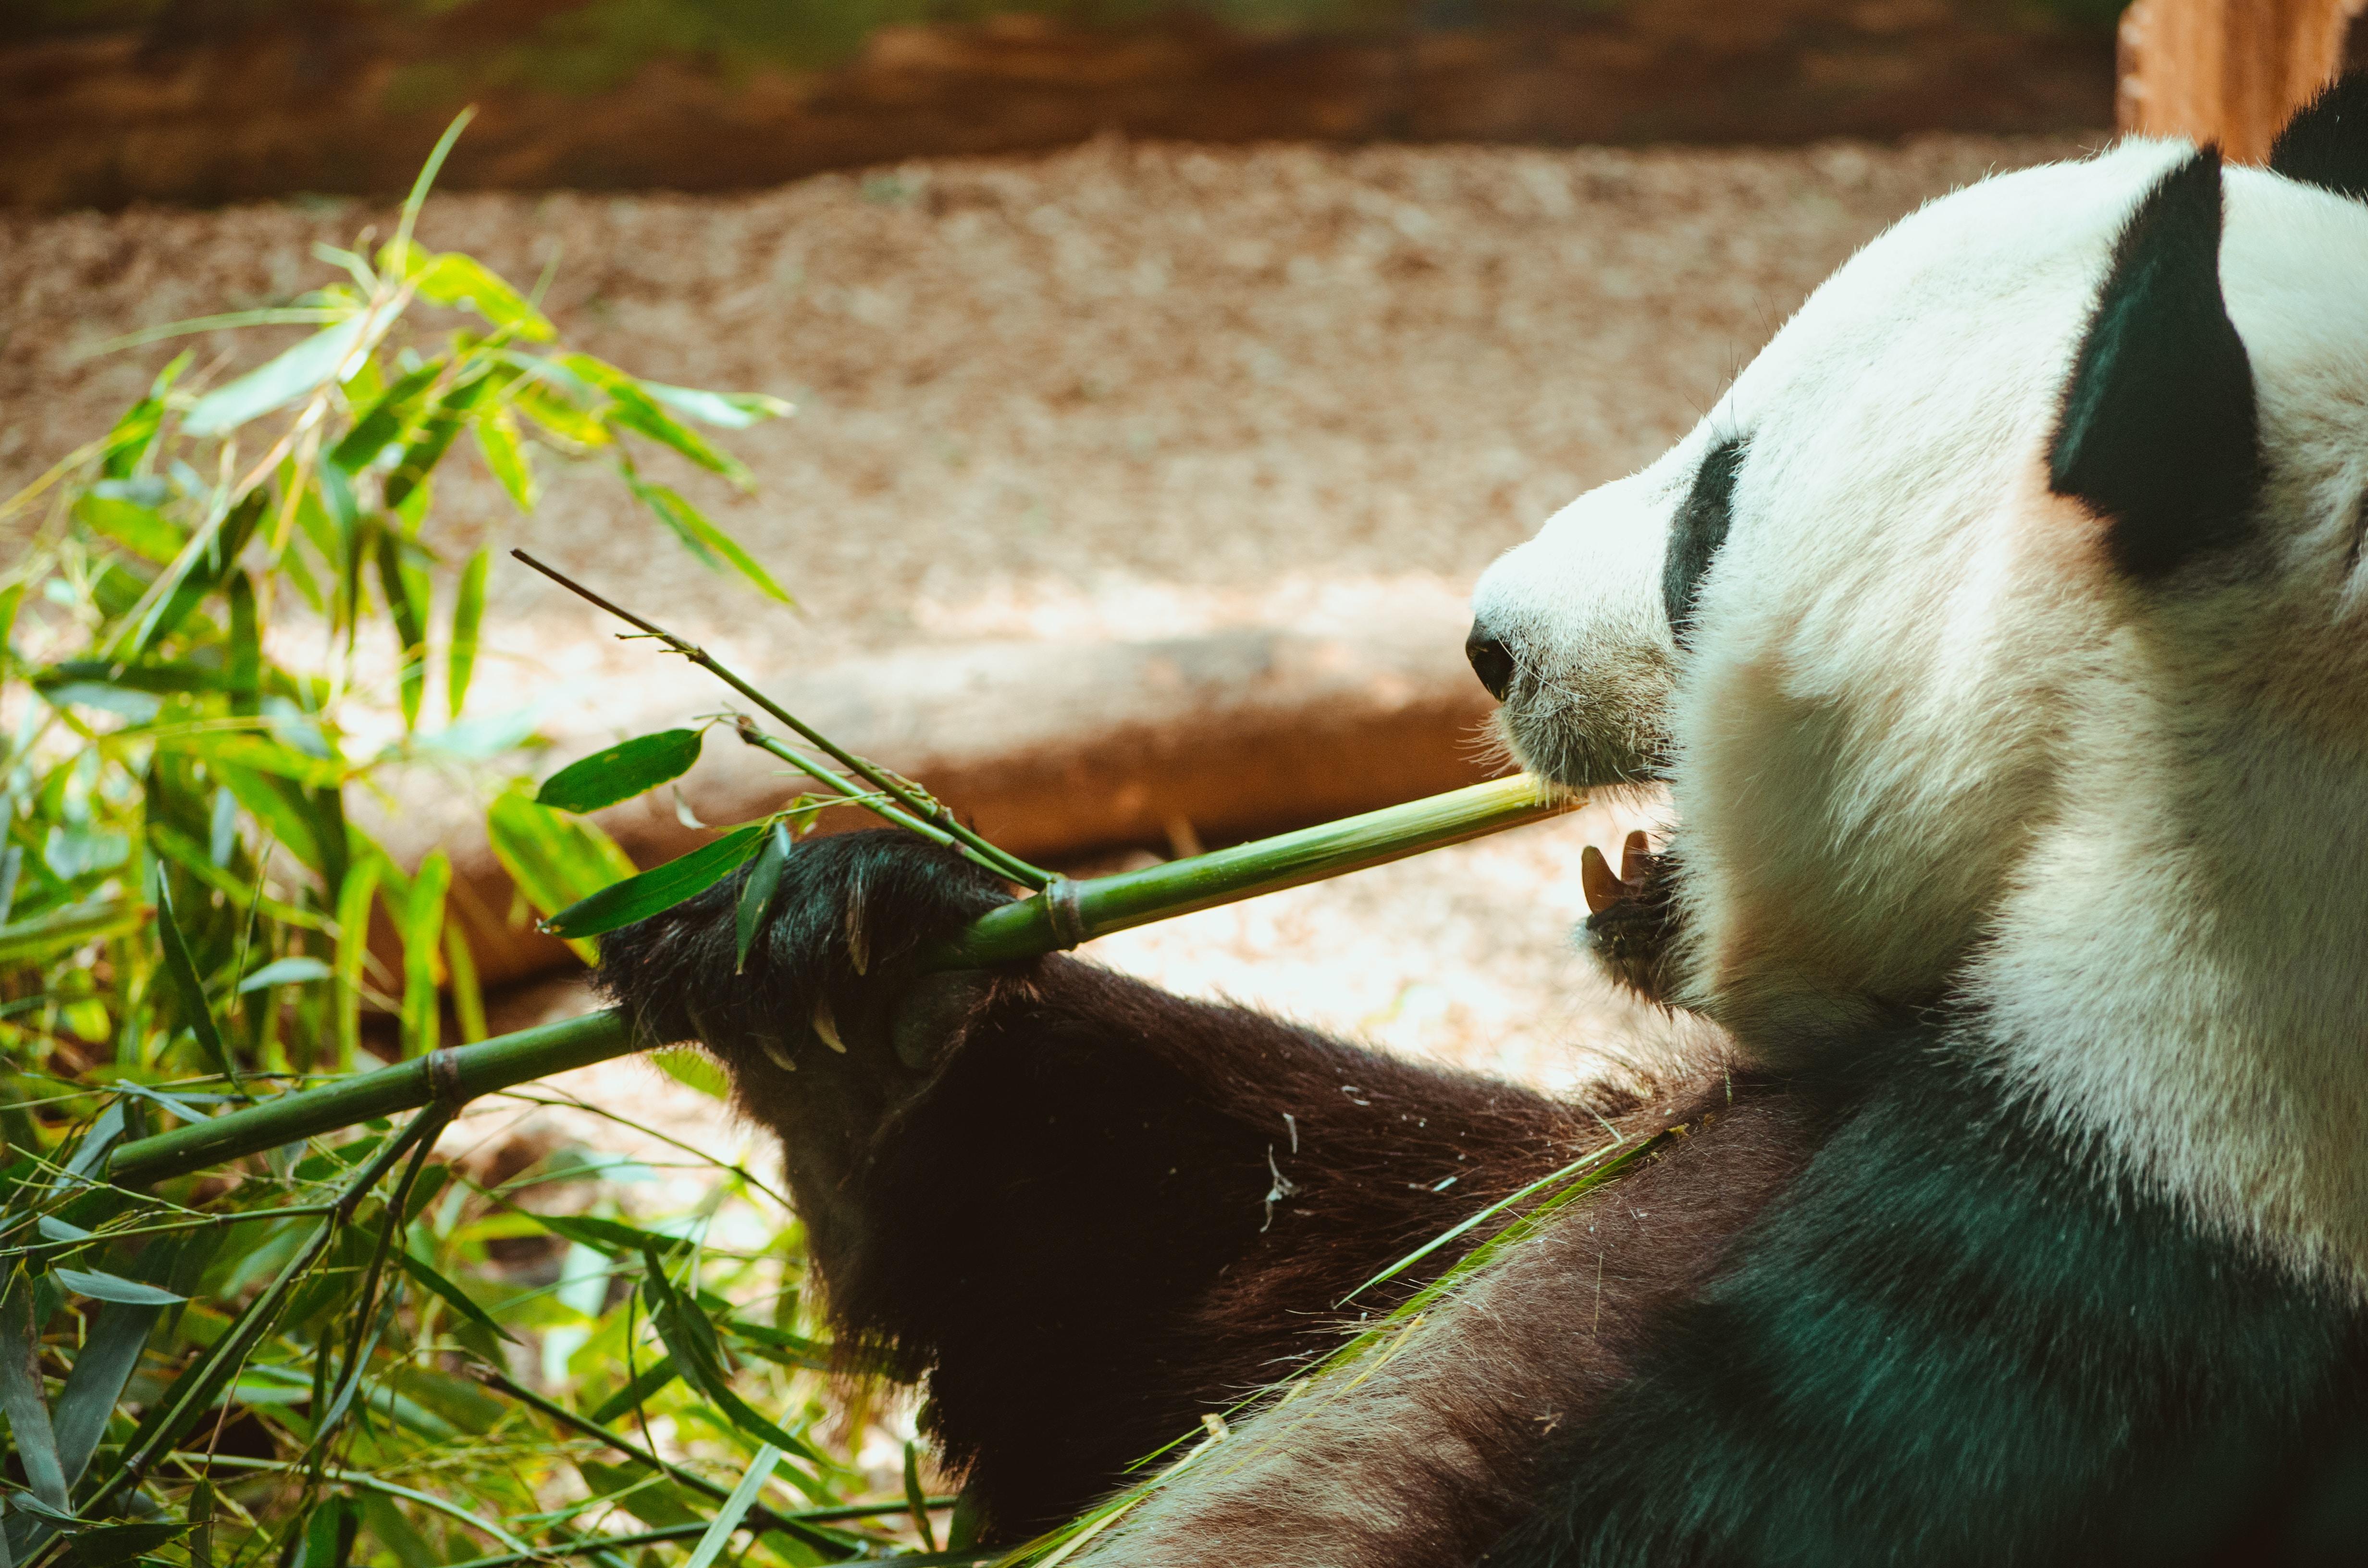 panda holding green bamboo while eating